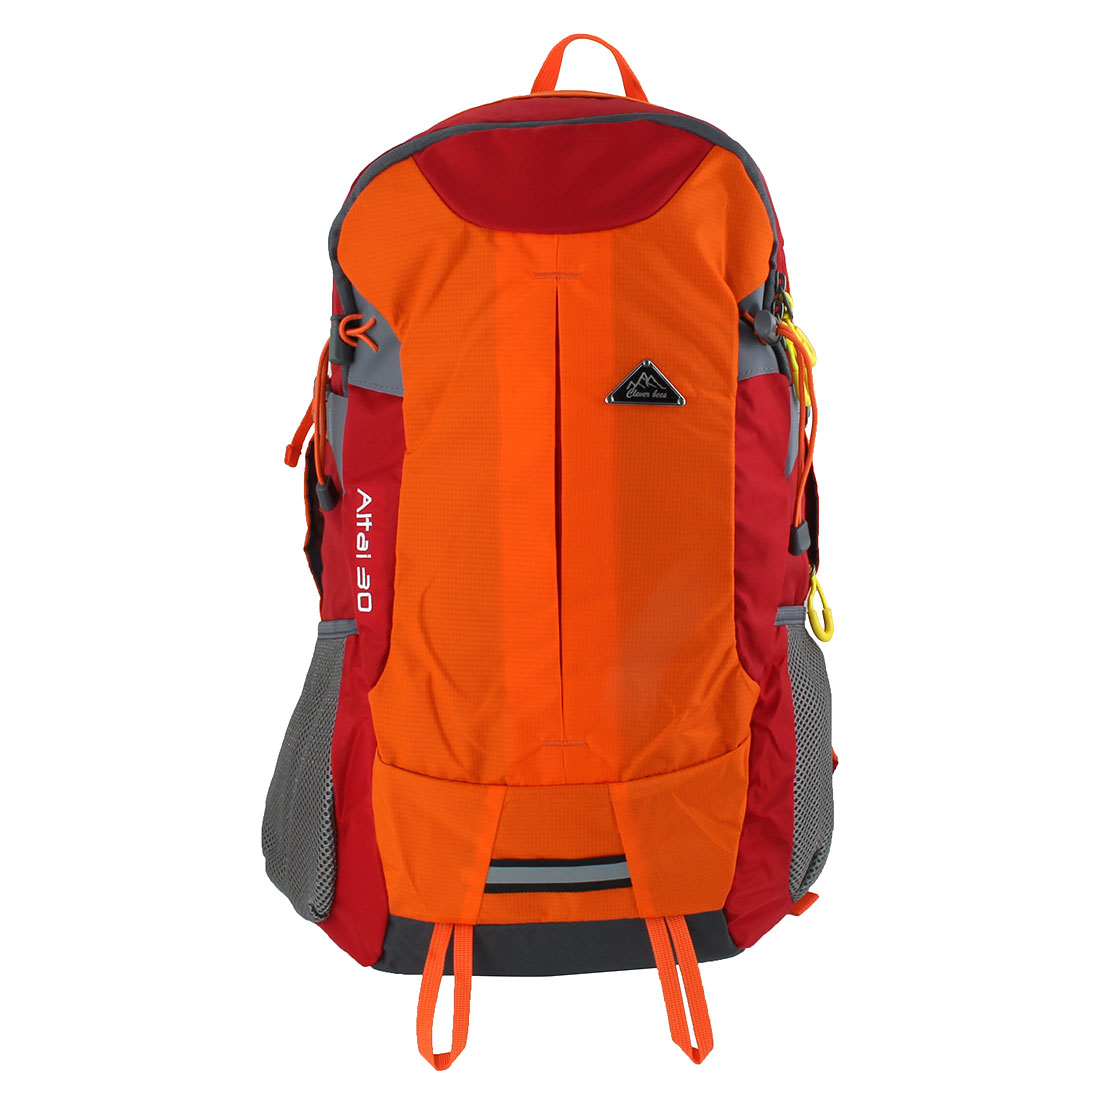 Trekking Camping Mountaineering Pack Outdoor Hiking Backpack Orange